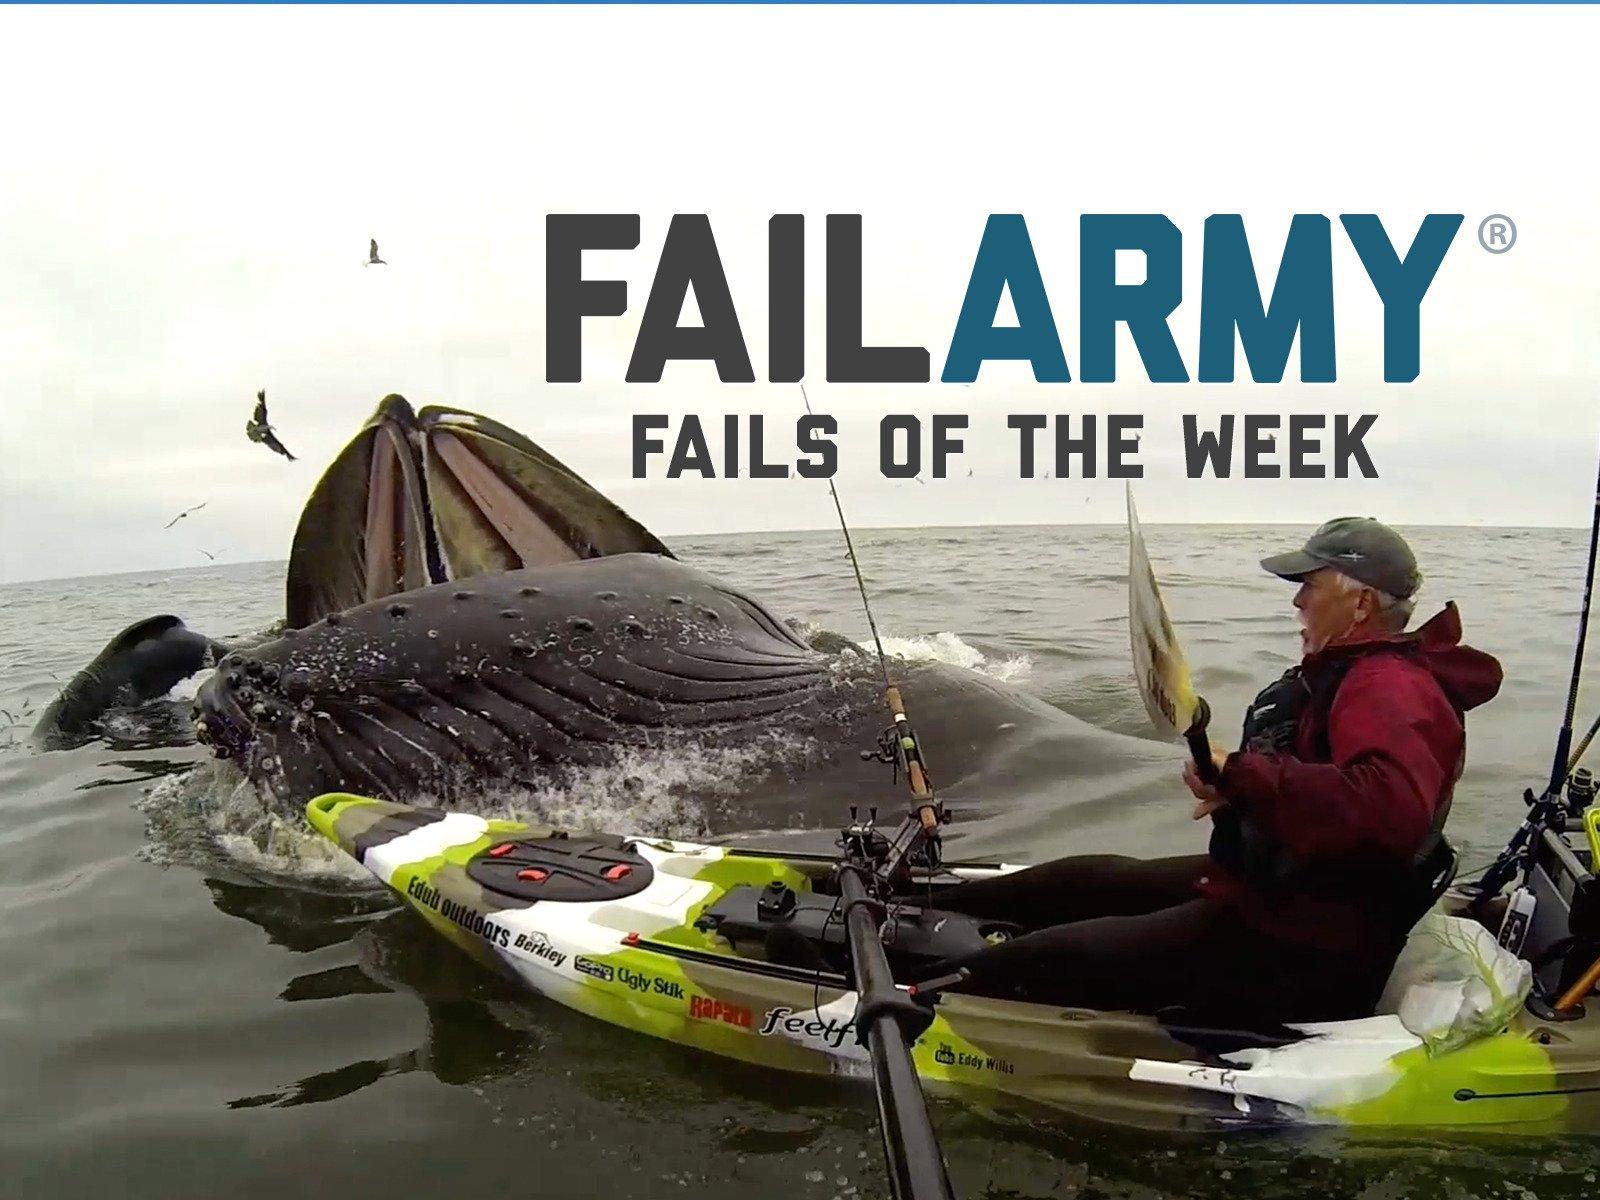 Clip: Fails of the Week - Season 11